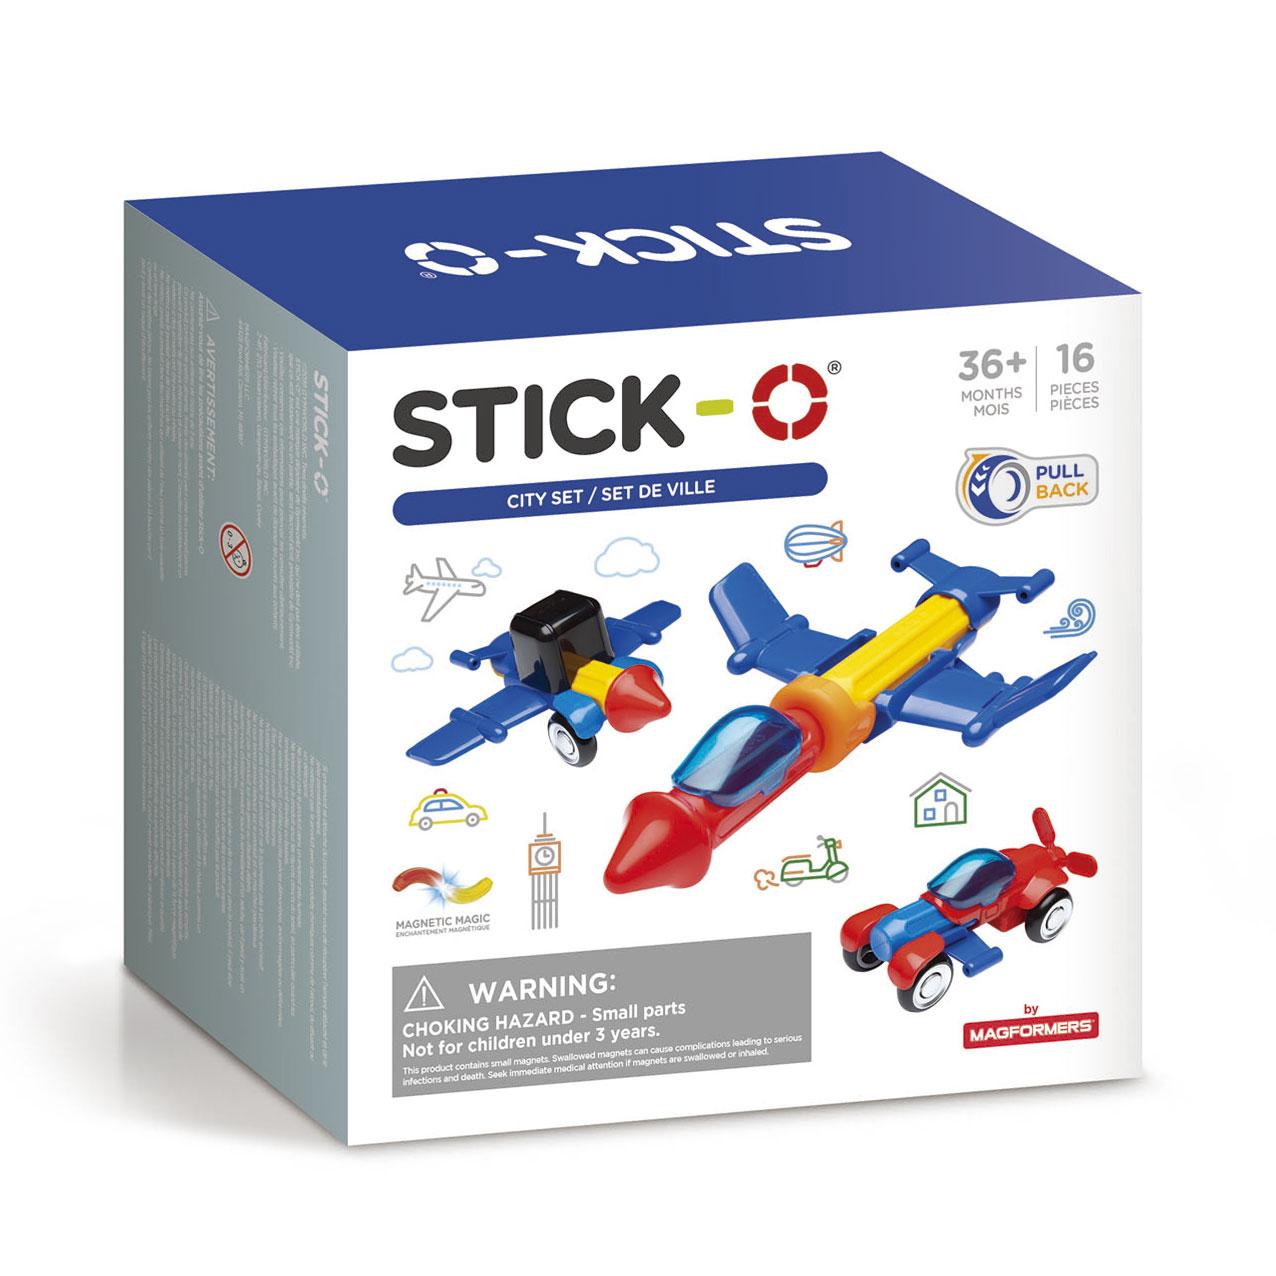 Stick-O magnetisch educatief